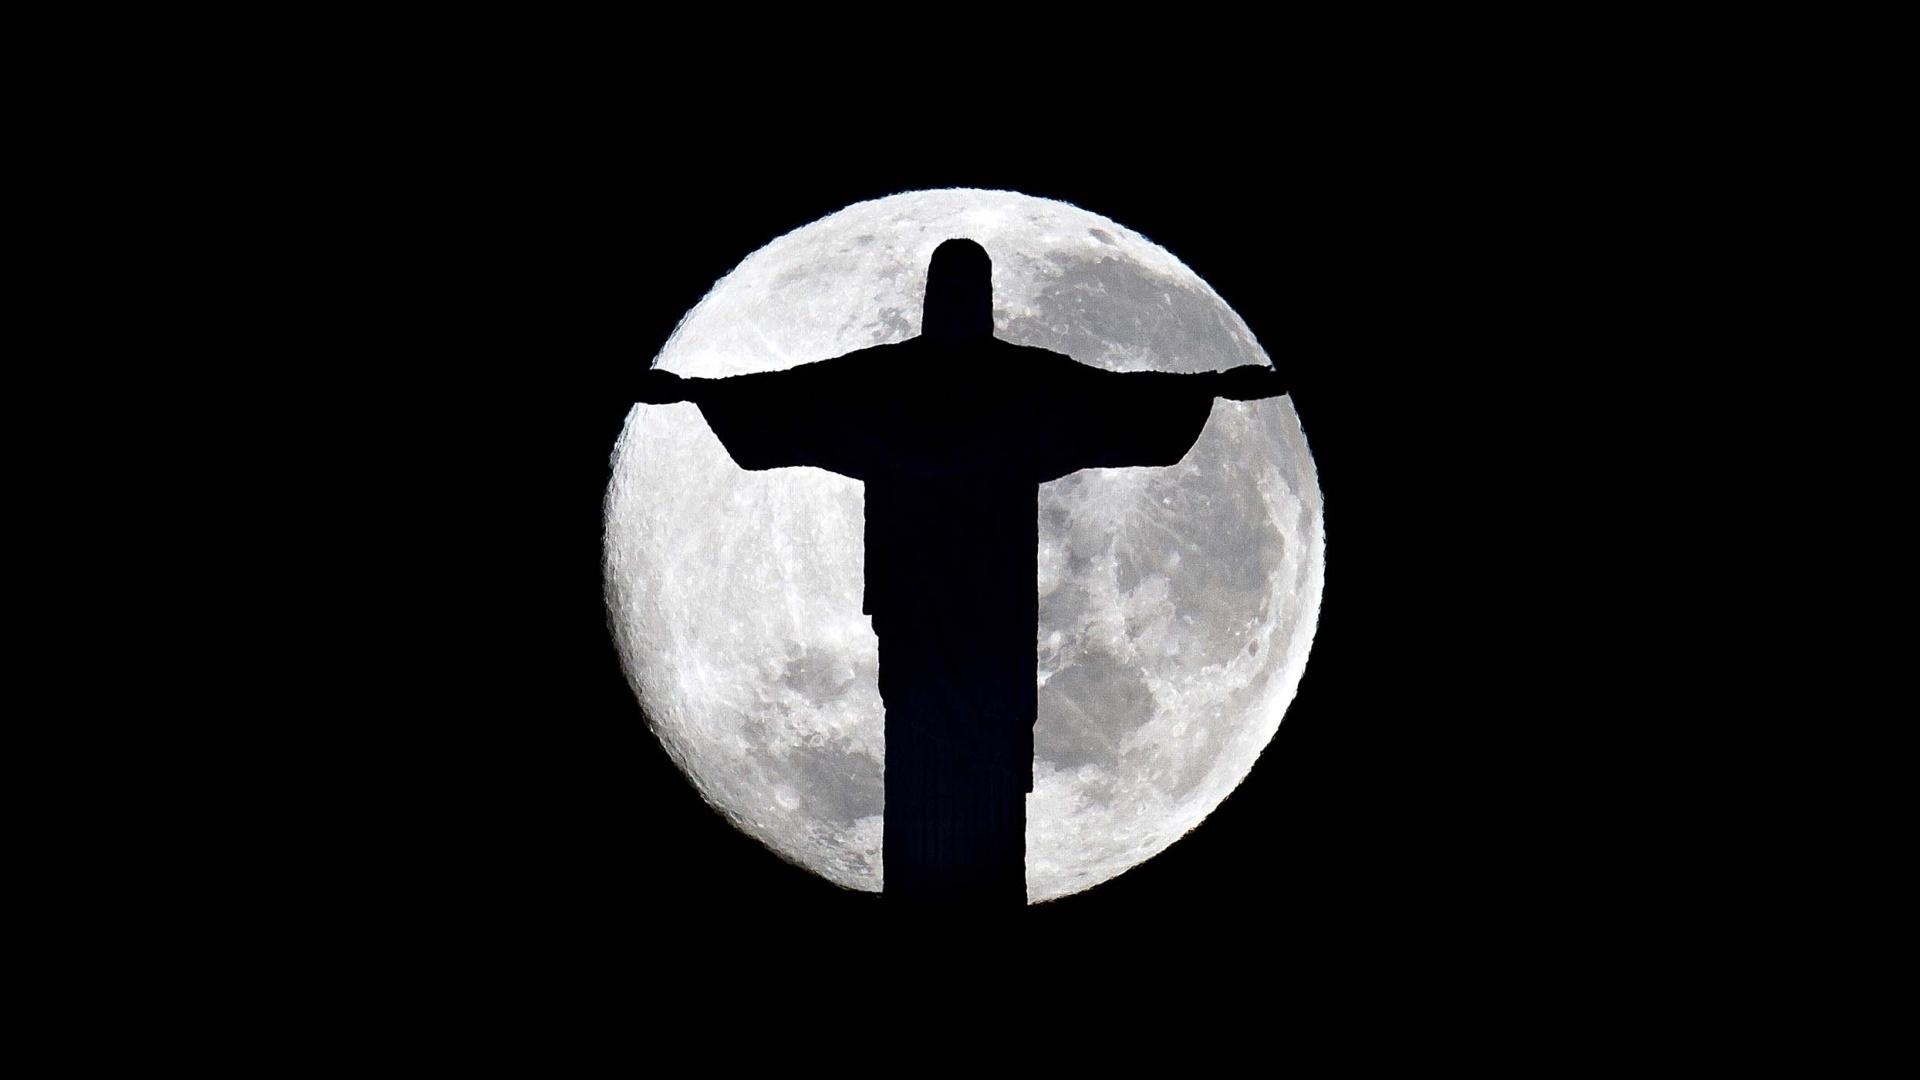 Jesus Christ Religion Christian Statue Wallpaper 1920x1080 47122